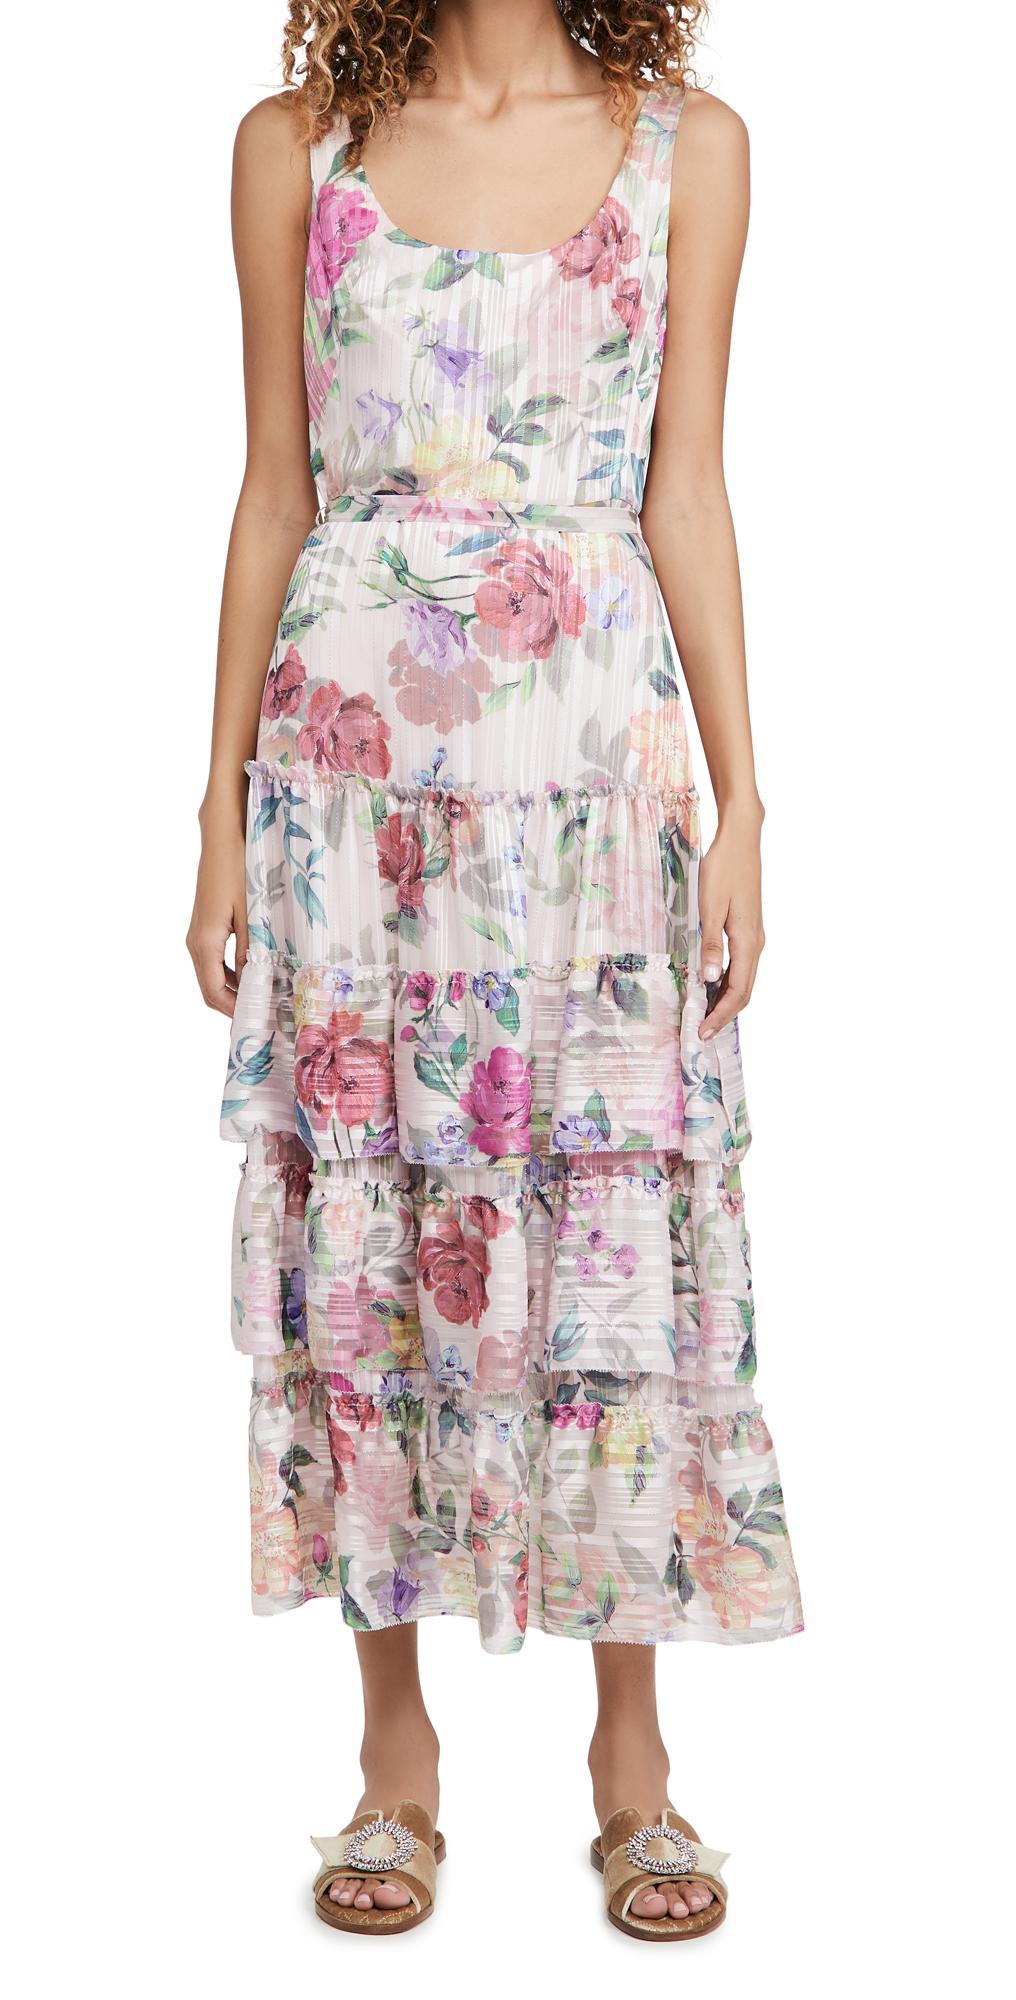 Marchesa Notte Printed Sleeveless Square Neck Dress